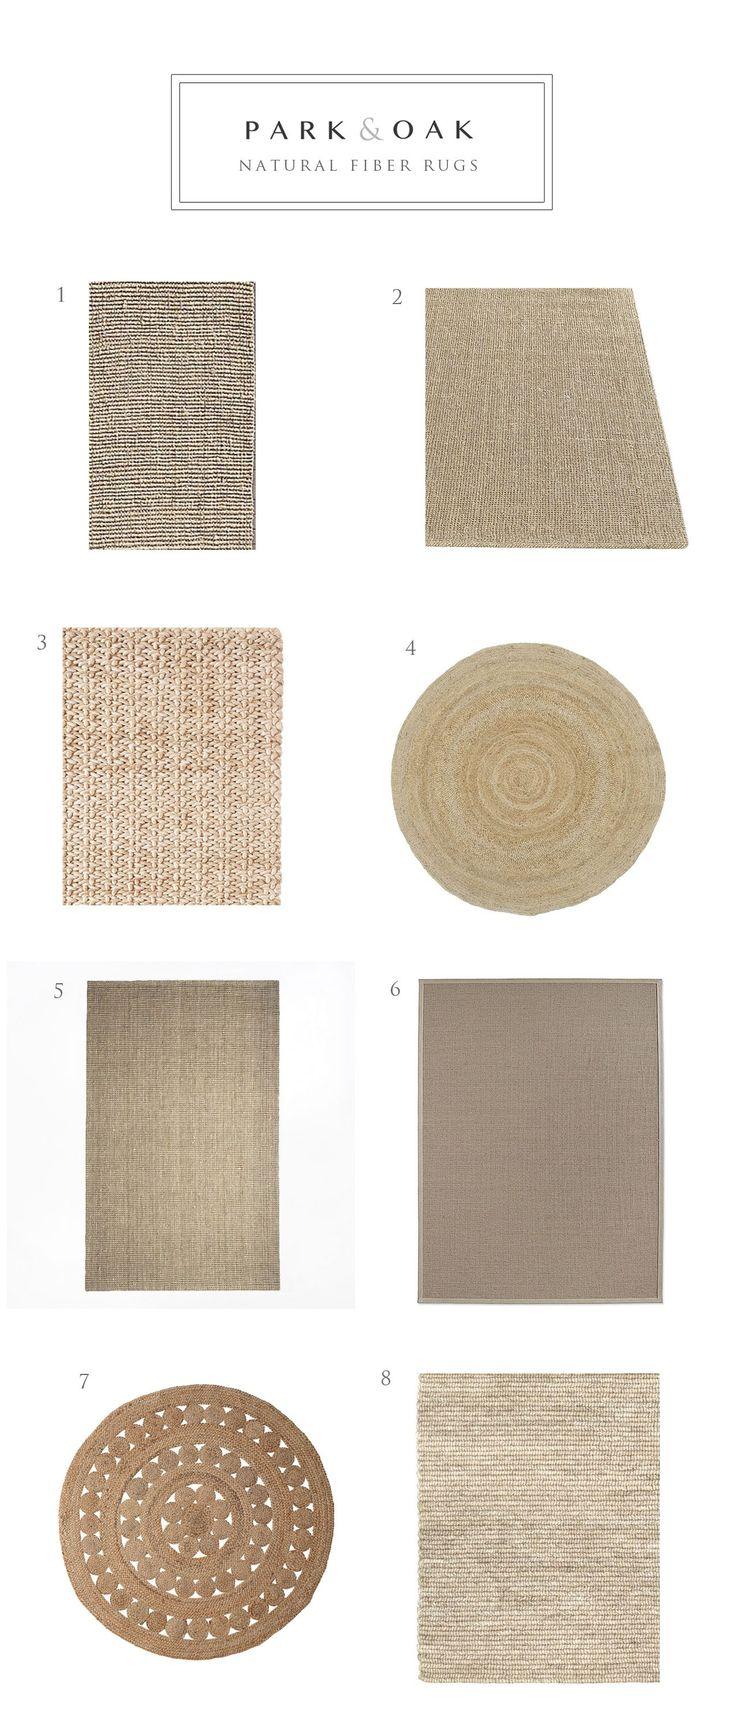 the+best+natural+fiber+rugs